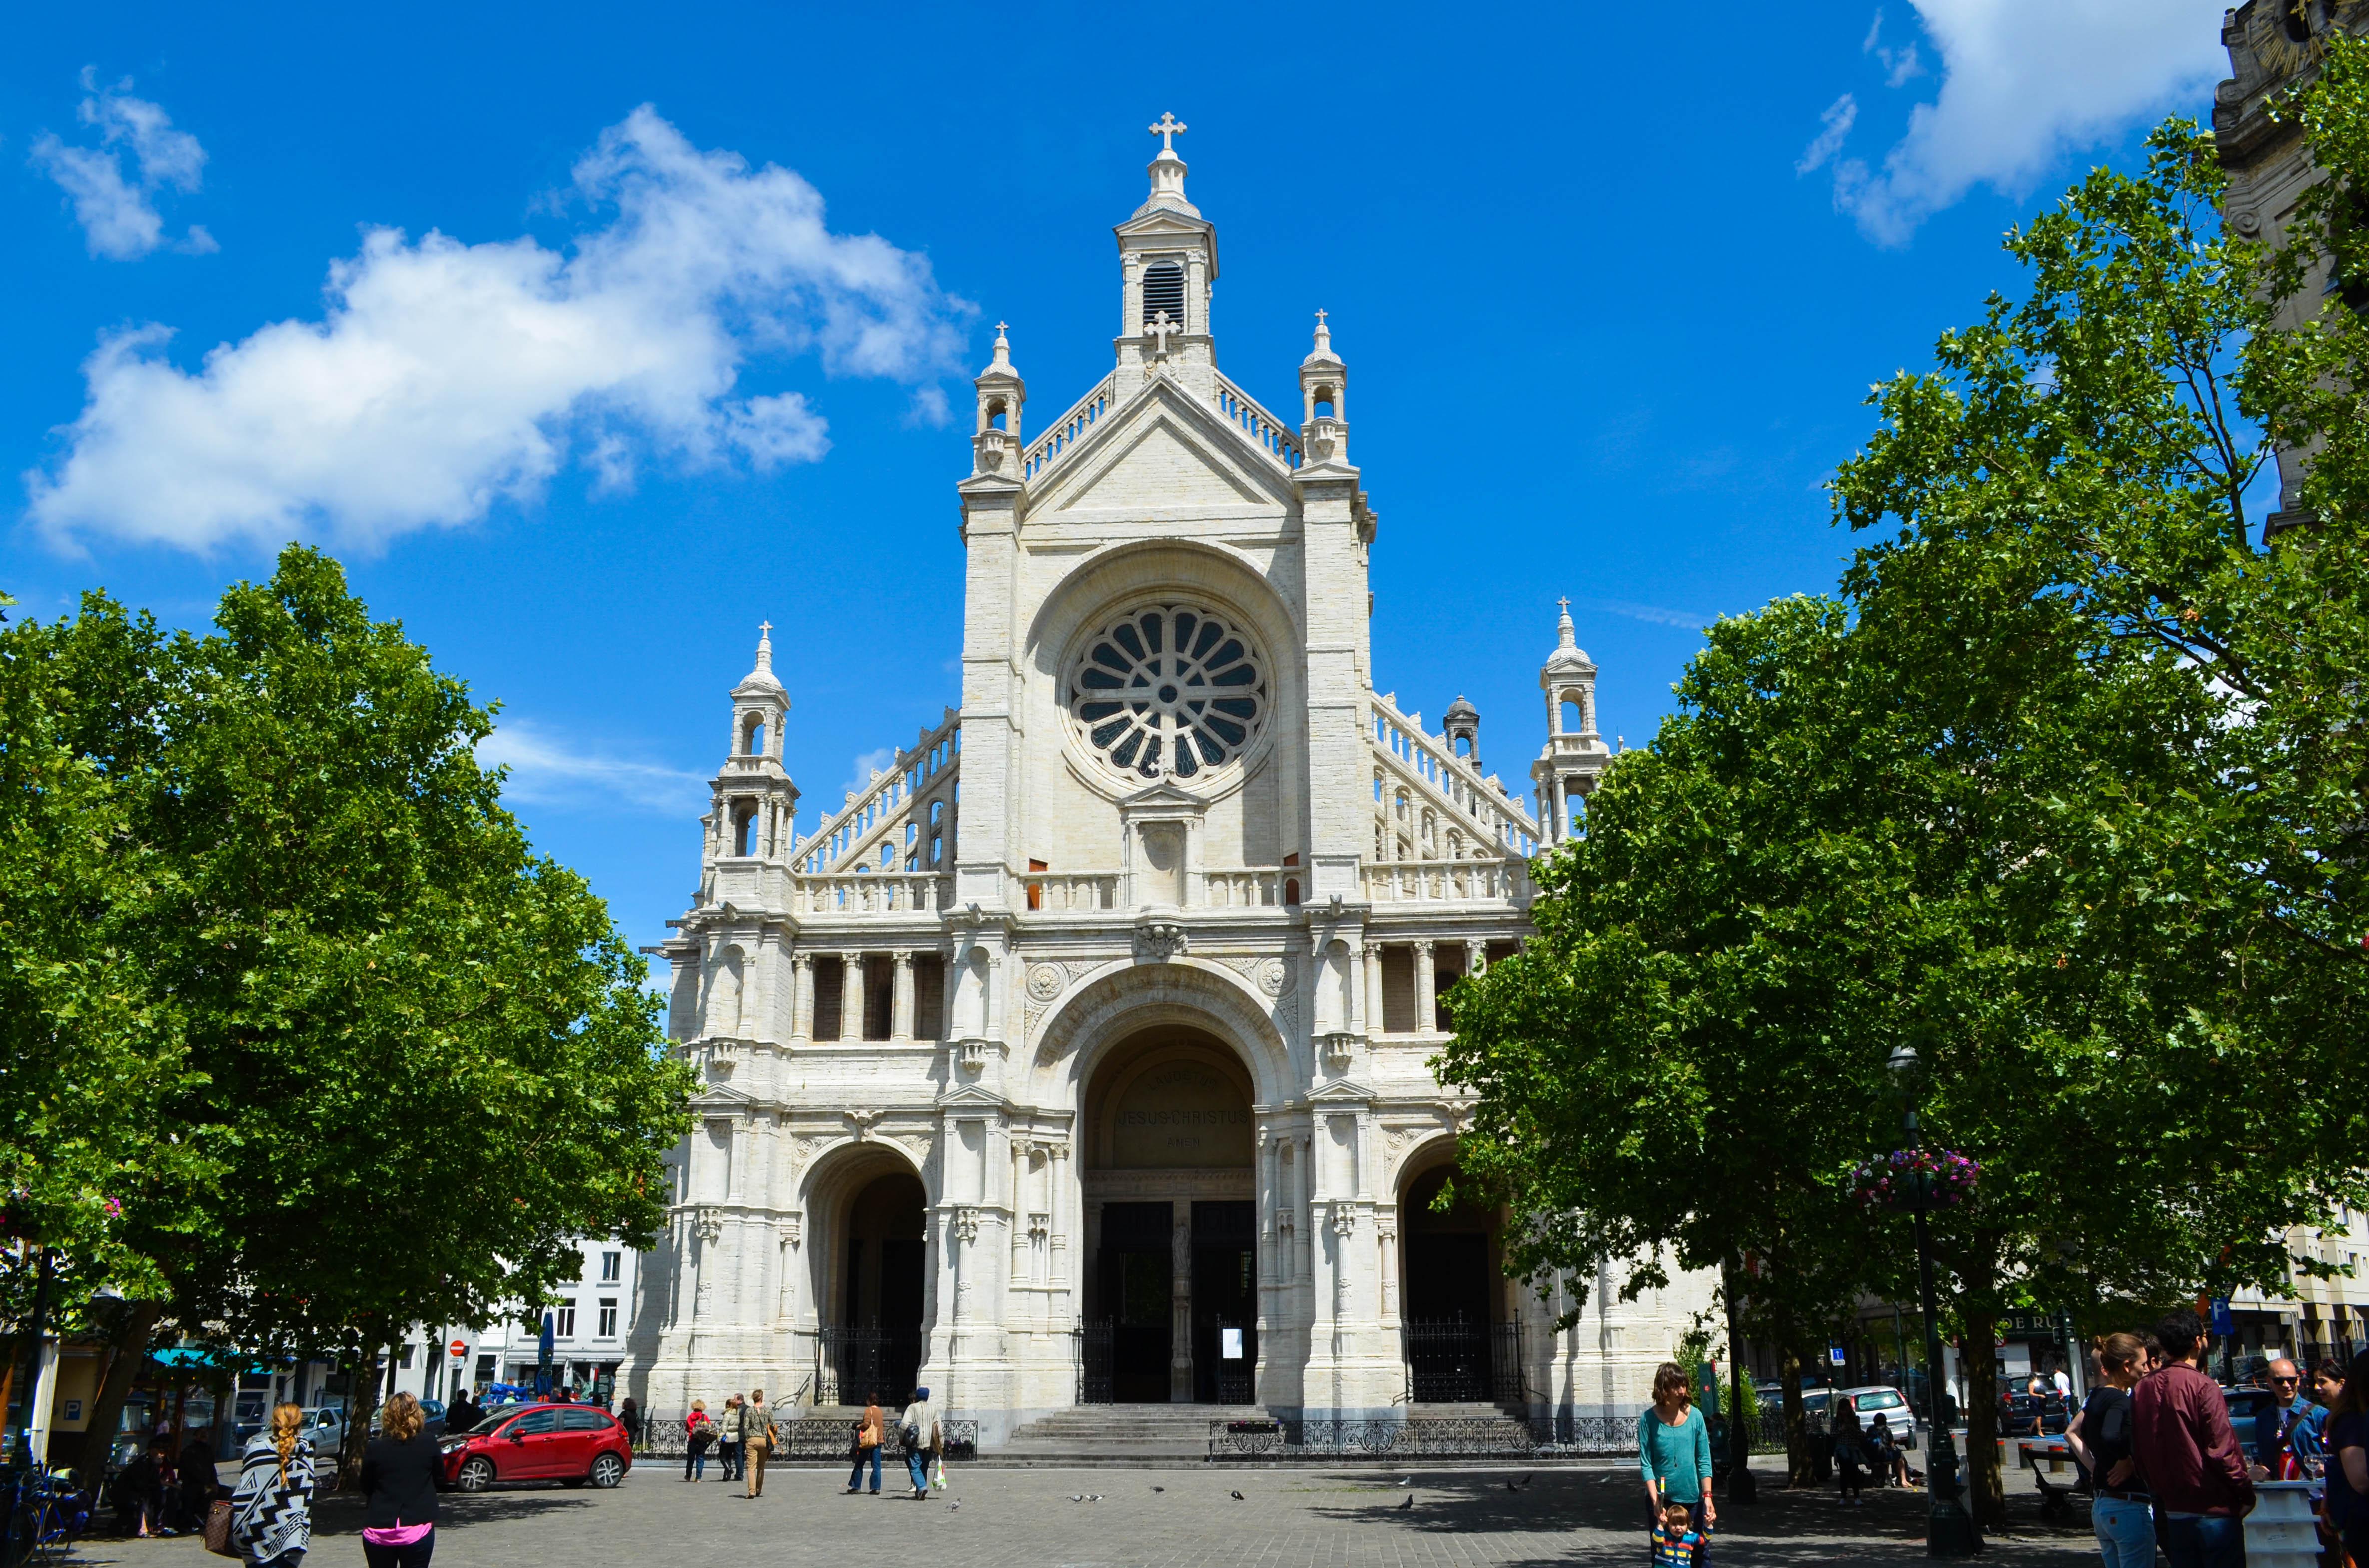 Sainte-Catherine Church